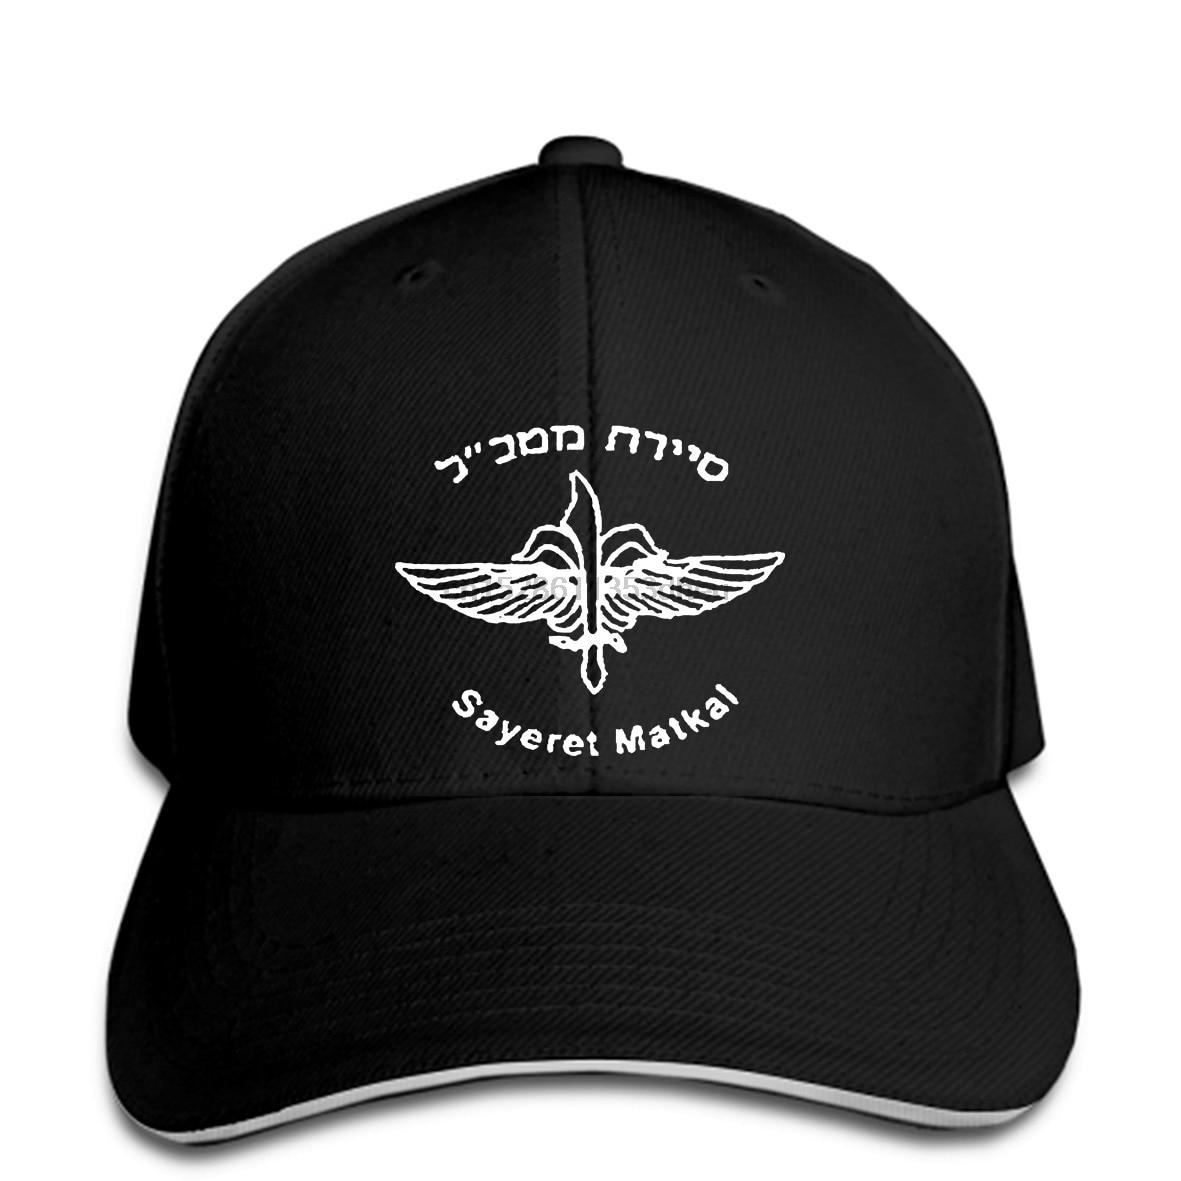 Ejército de Israel Fuerza Especial Sayeret Matkal a prueba de sudor de poliéster caliente gorra de béisbol snapback sombrero pico